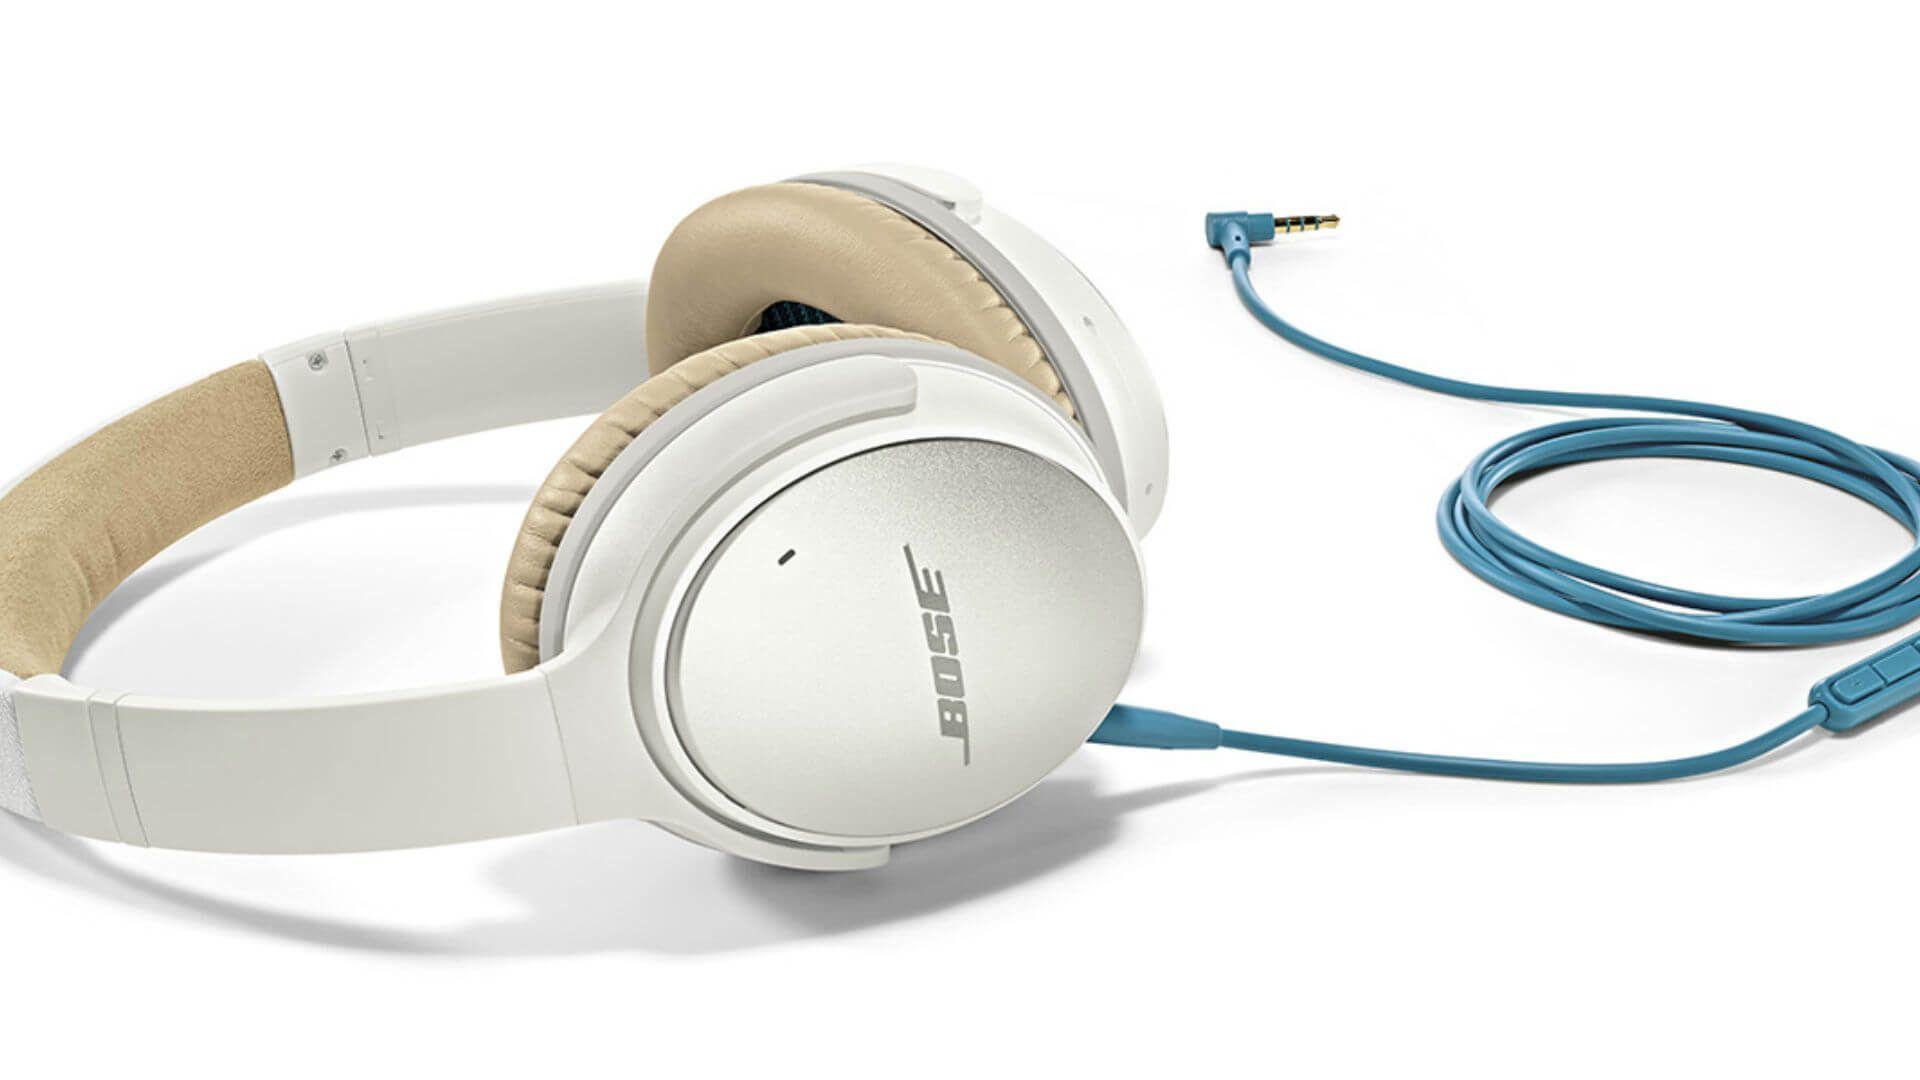 Bose Quietcomfort 25 Review Techx Headphones Bose Headphones Noise Cancelling Headphones